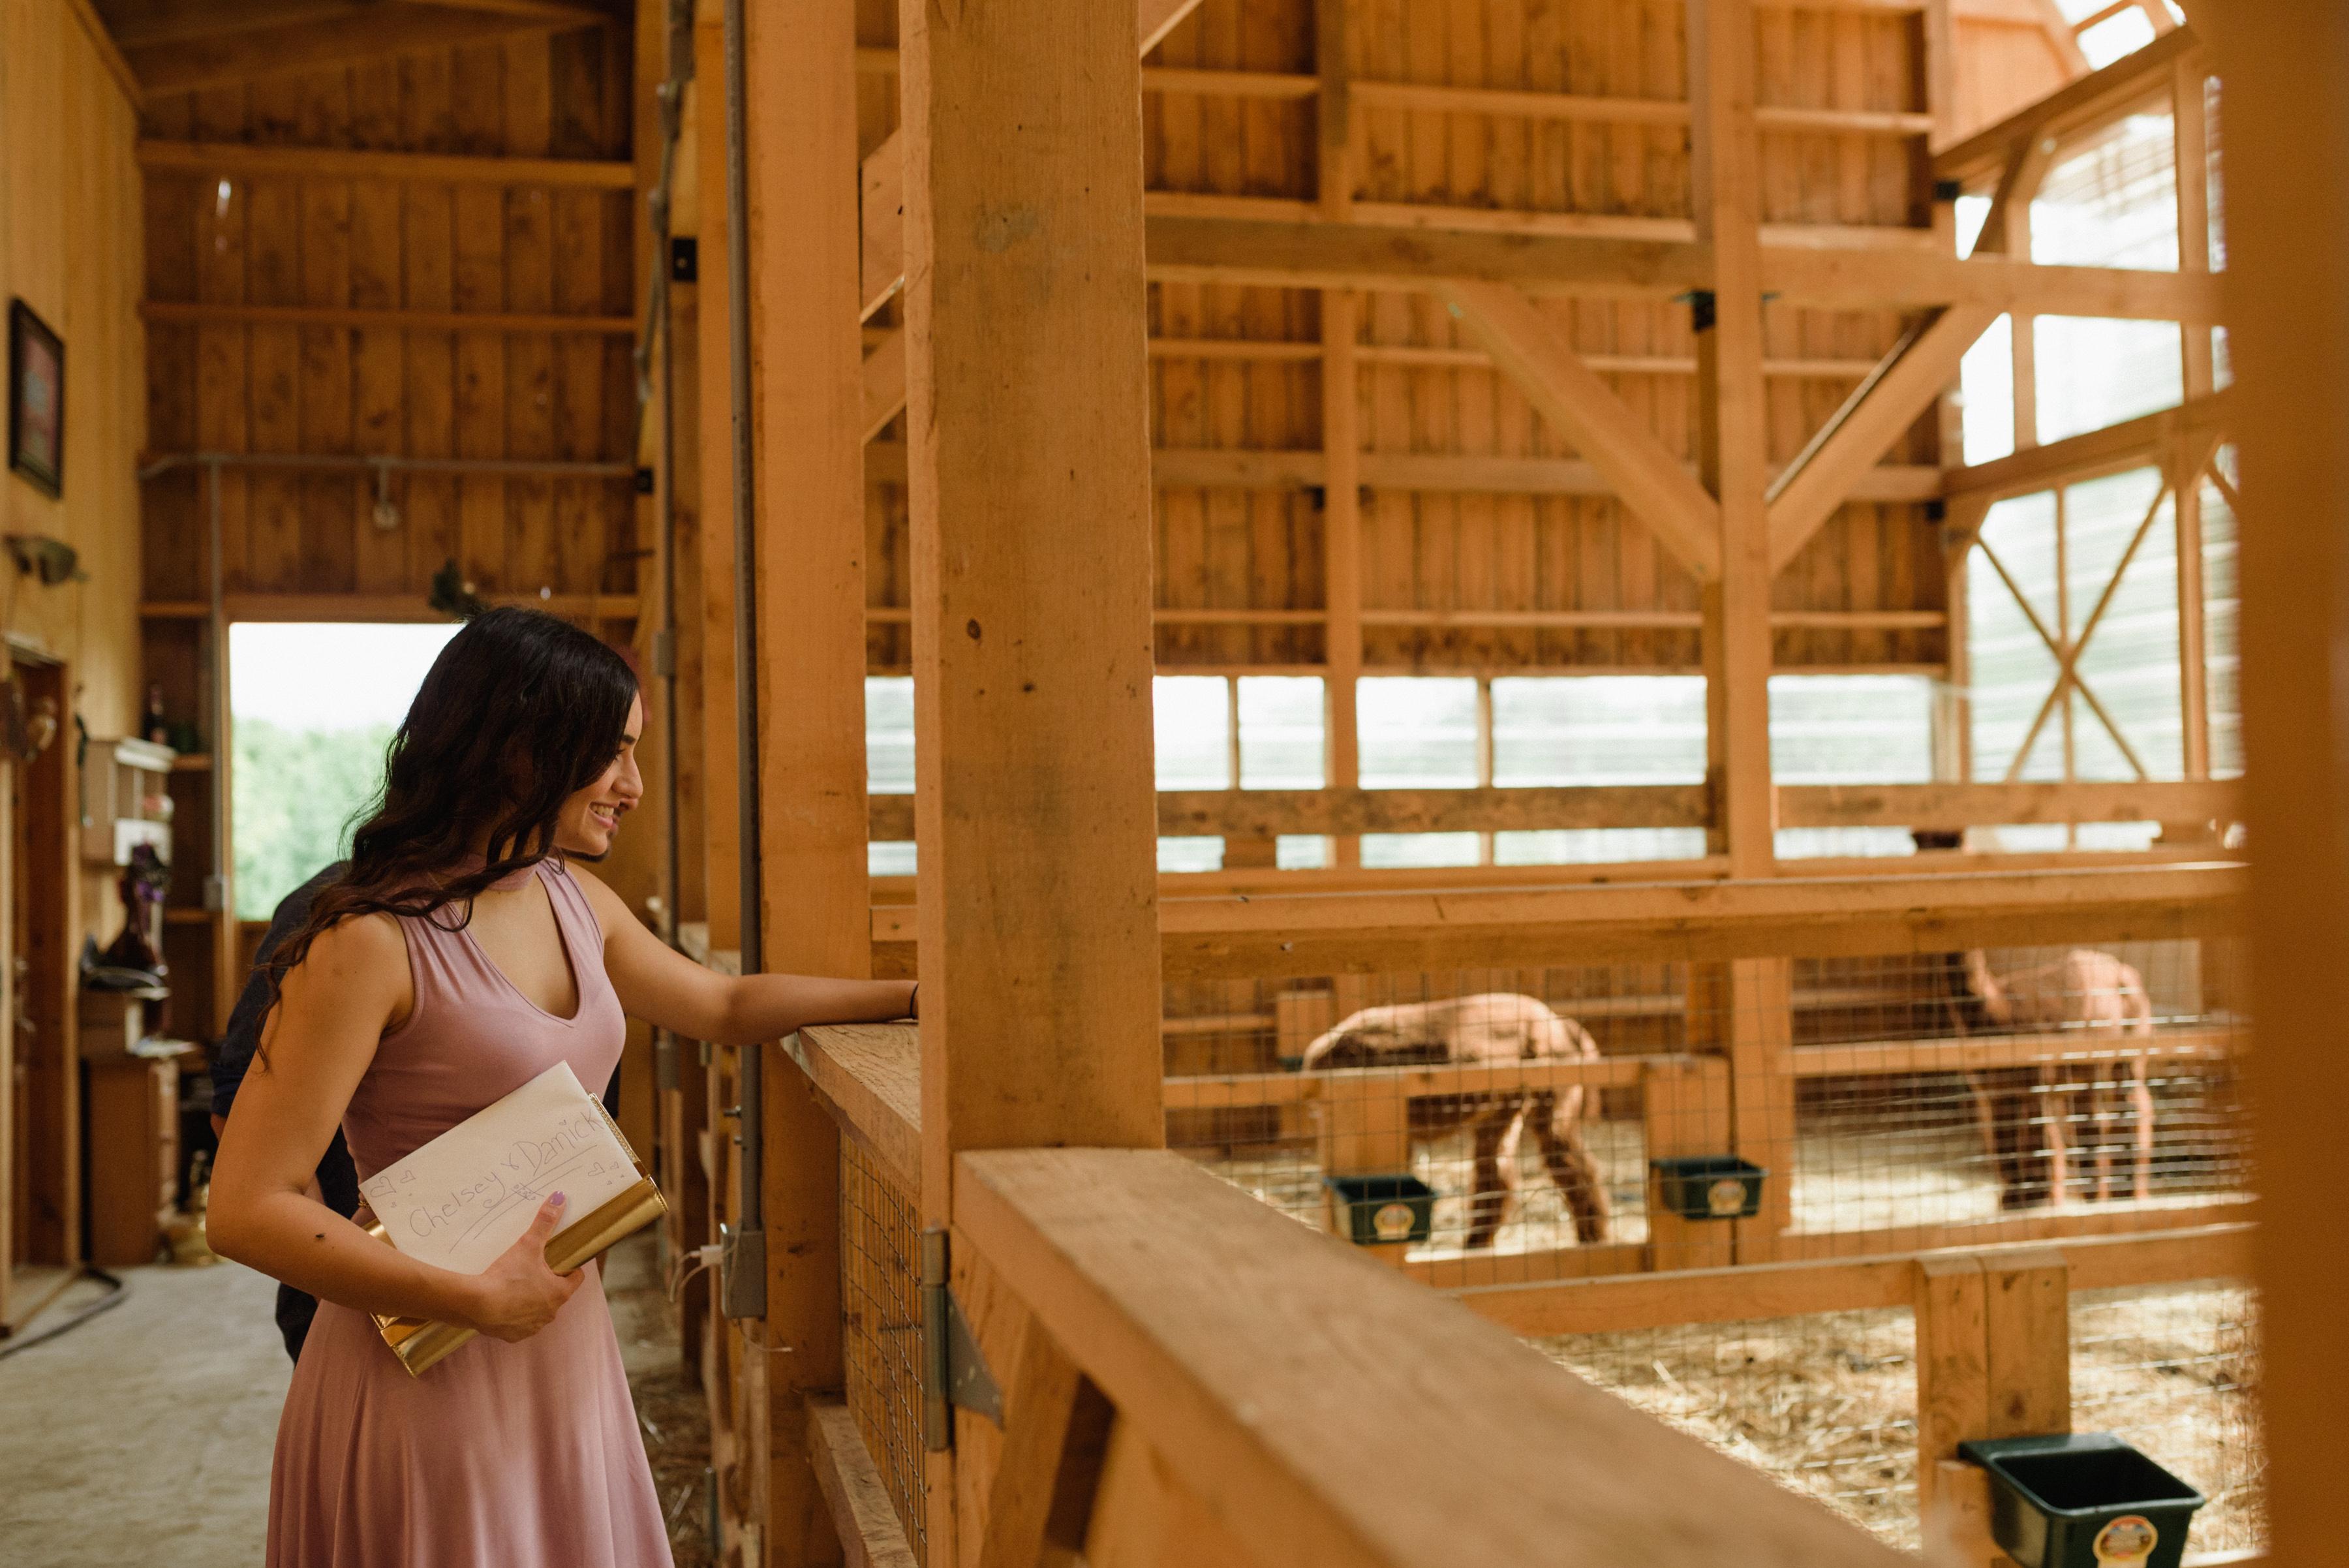 Wedding guest looking at alpacas in barn